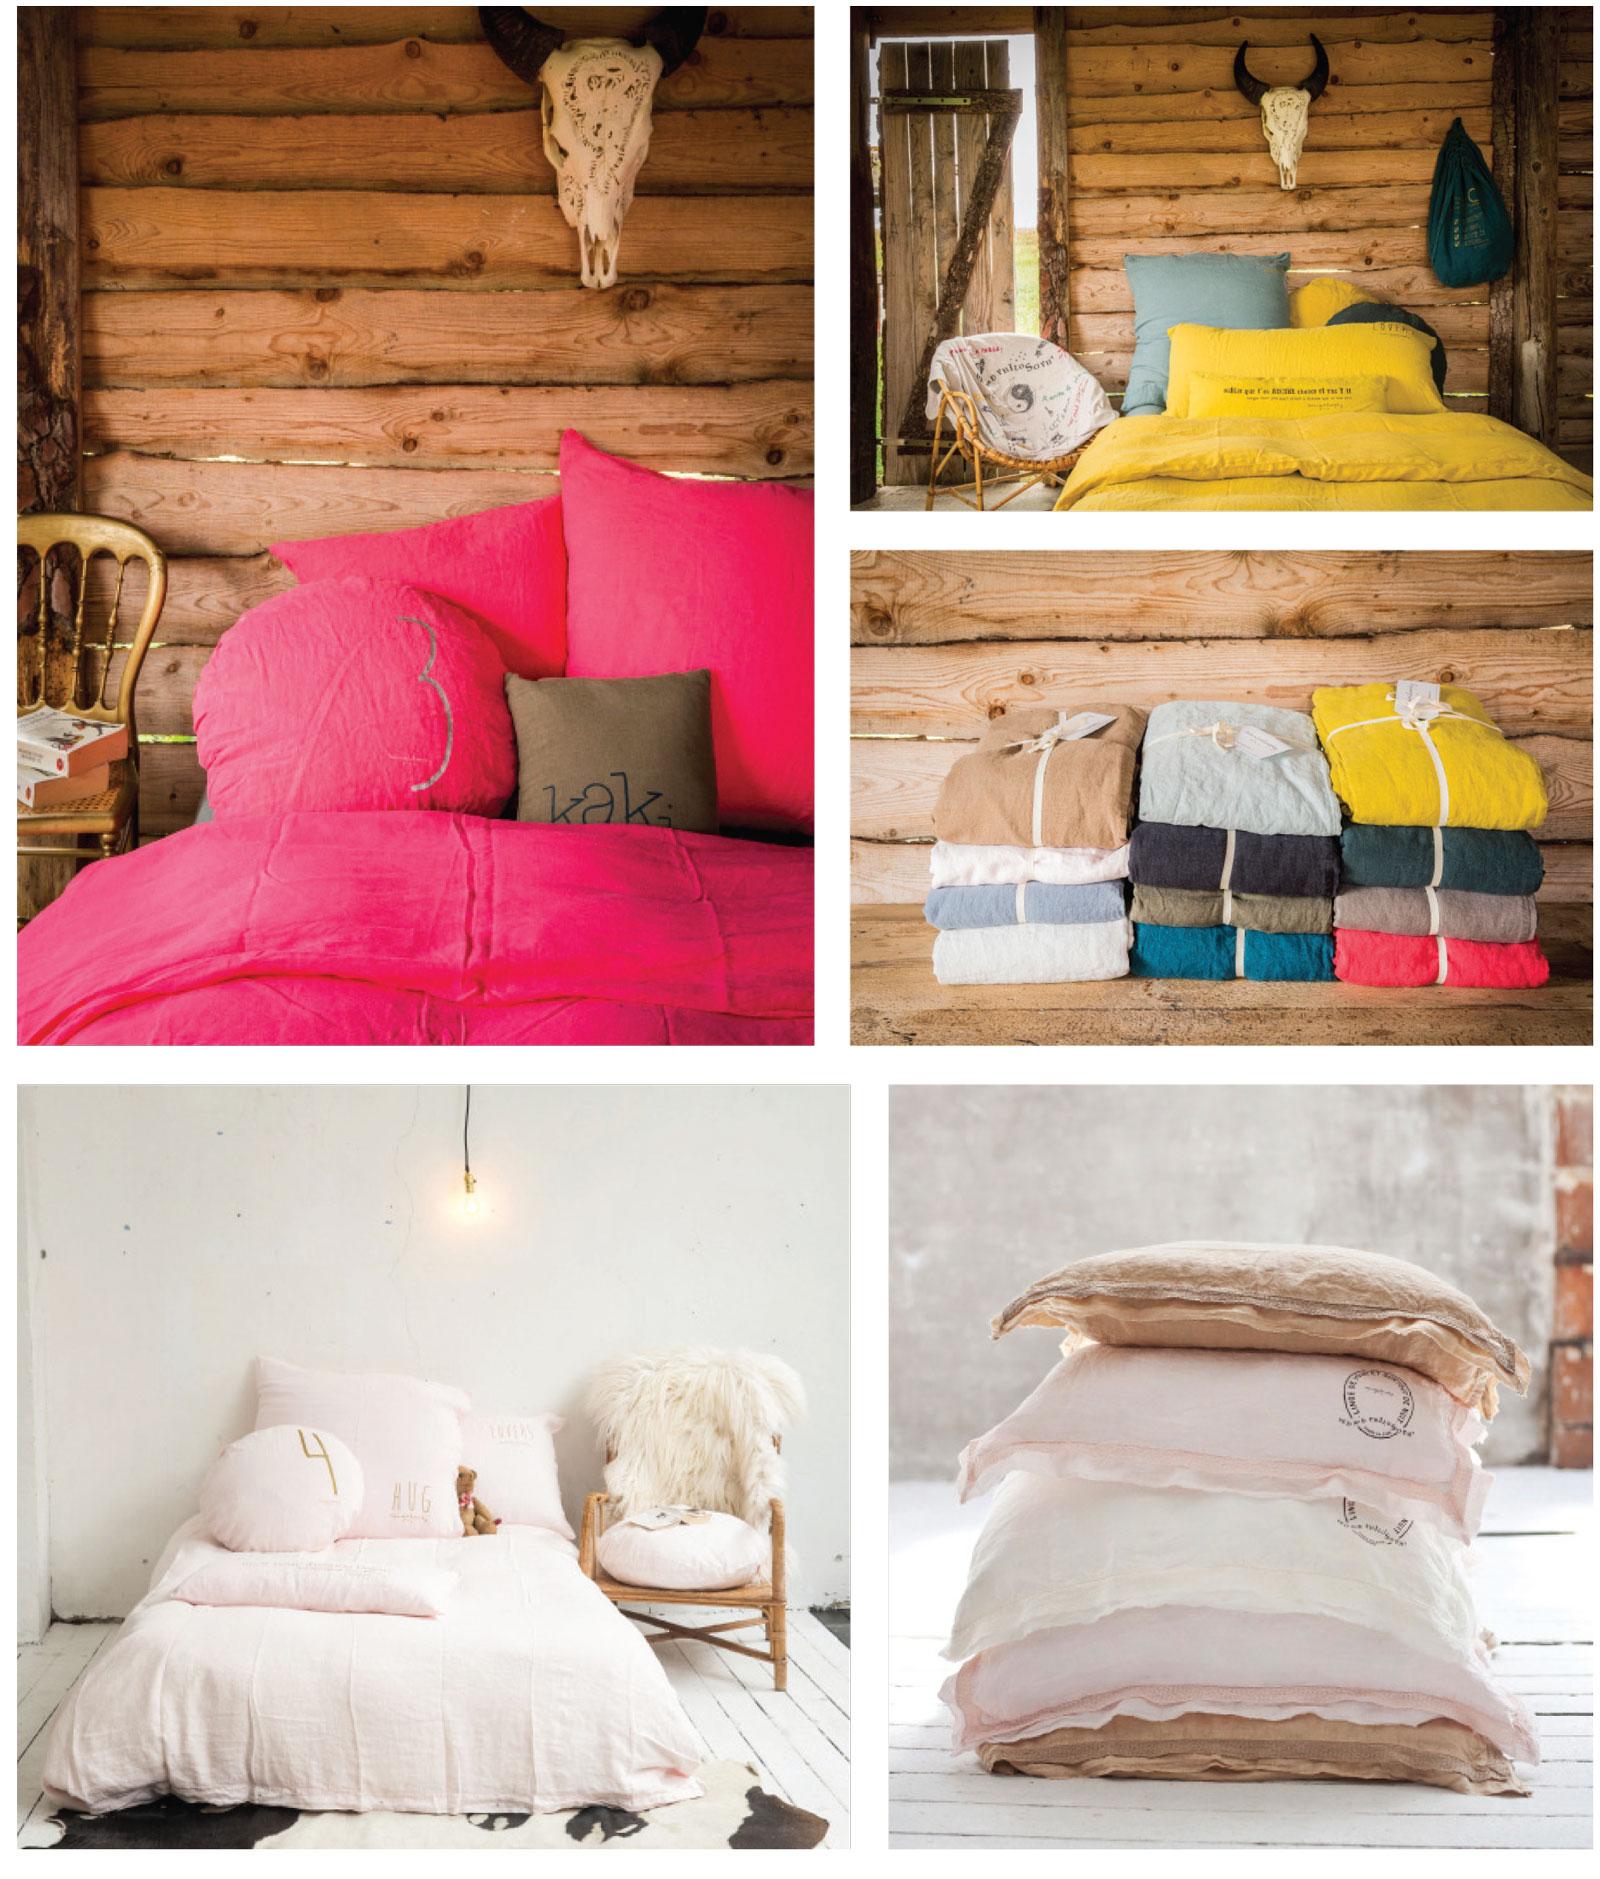 bed-philosophy-linge-de-lit